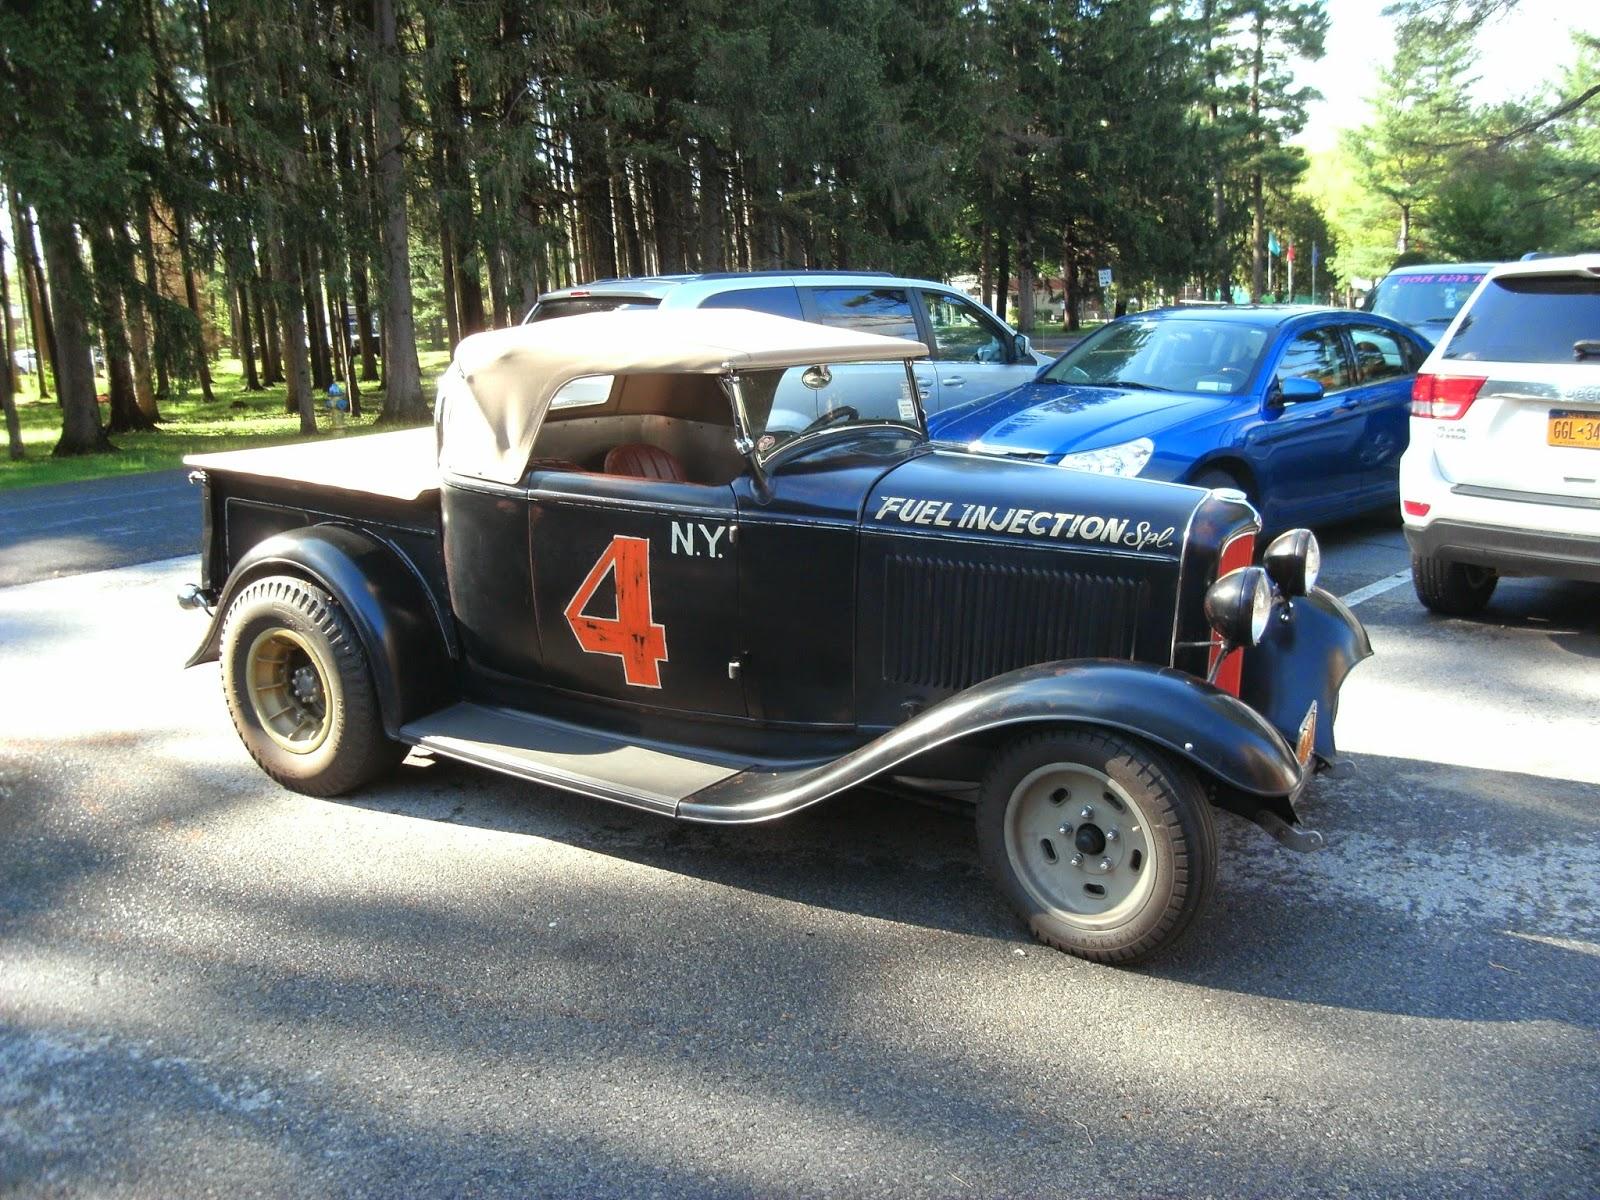 CARHUNTER IN MY OWN BACKYARDSARATOGA SPRINGSALBANY PART - Saratoga auto museum car show